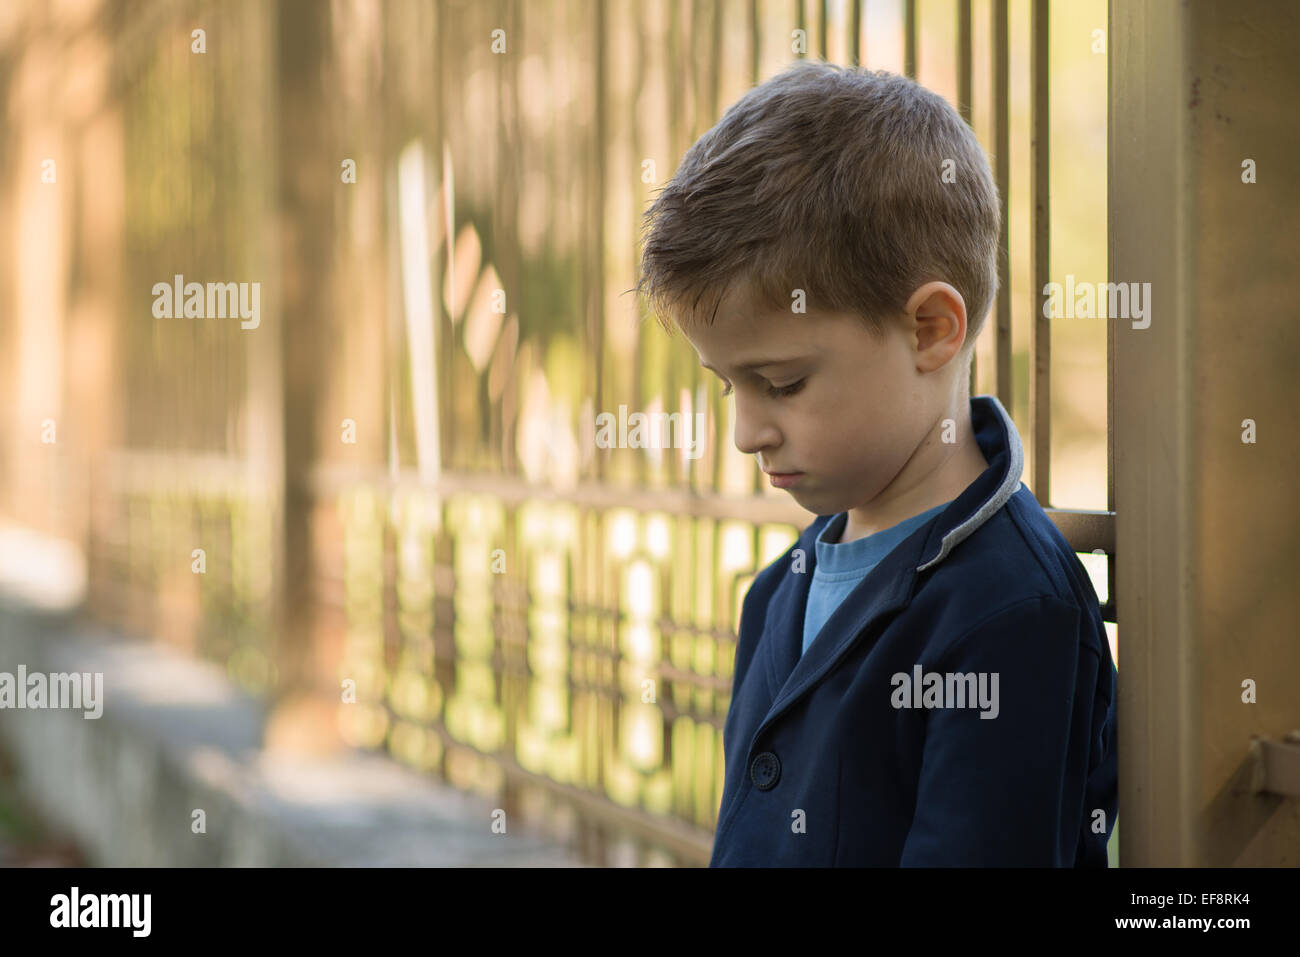 Portrait of a sad boy leaning against metal railings - Stock Image